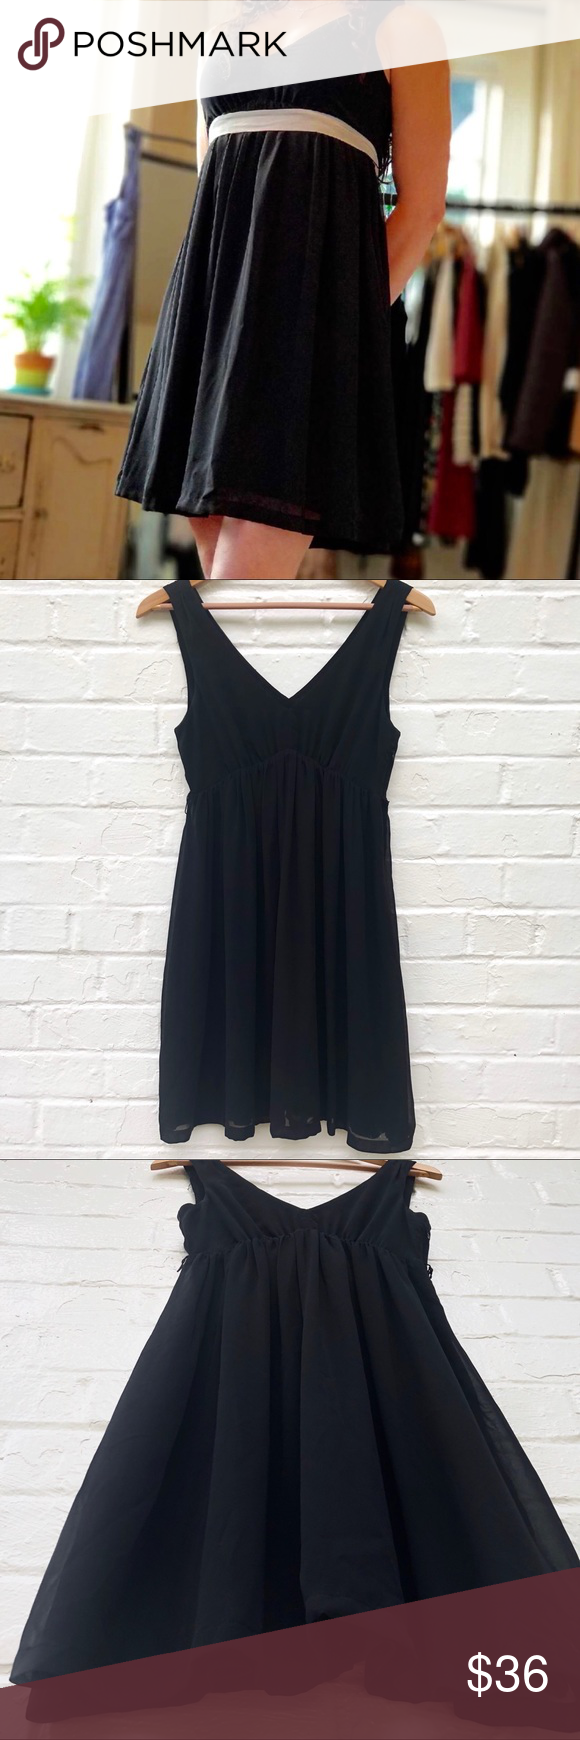 Aeo Sleeveless Empire Chiffon Little Black Dress Little Black Dress American Eagle Outfitters Dresses Dresses [ 1740 x 580 Pixel ]